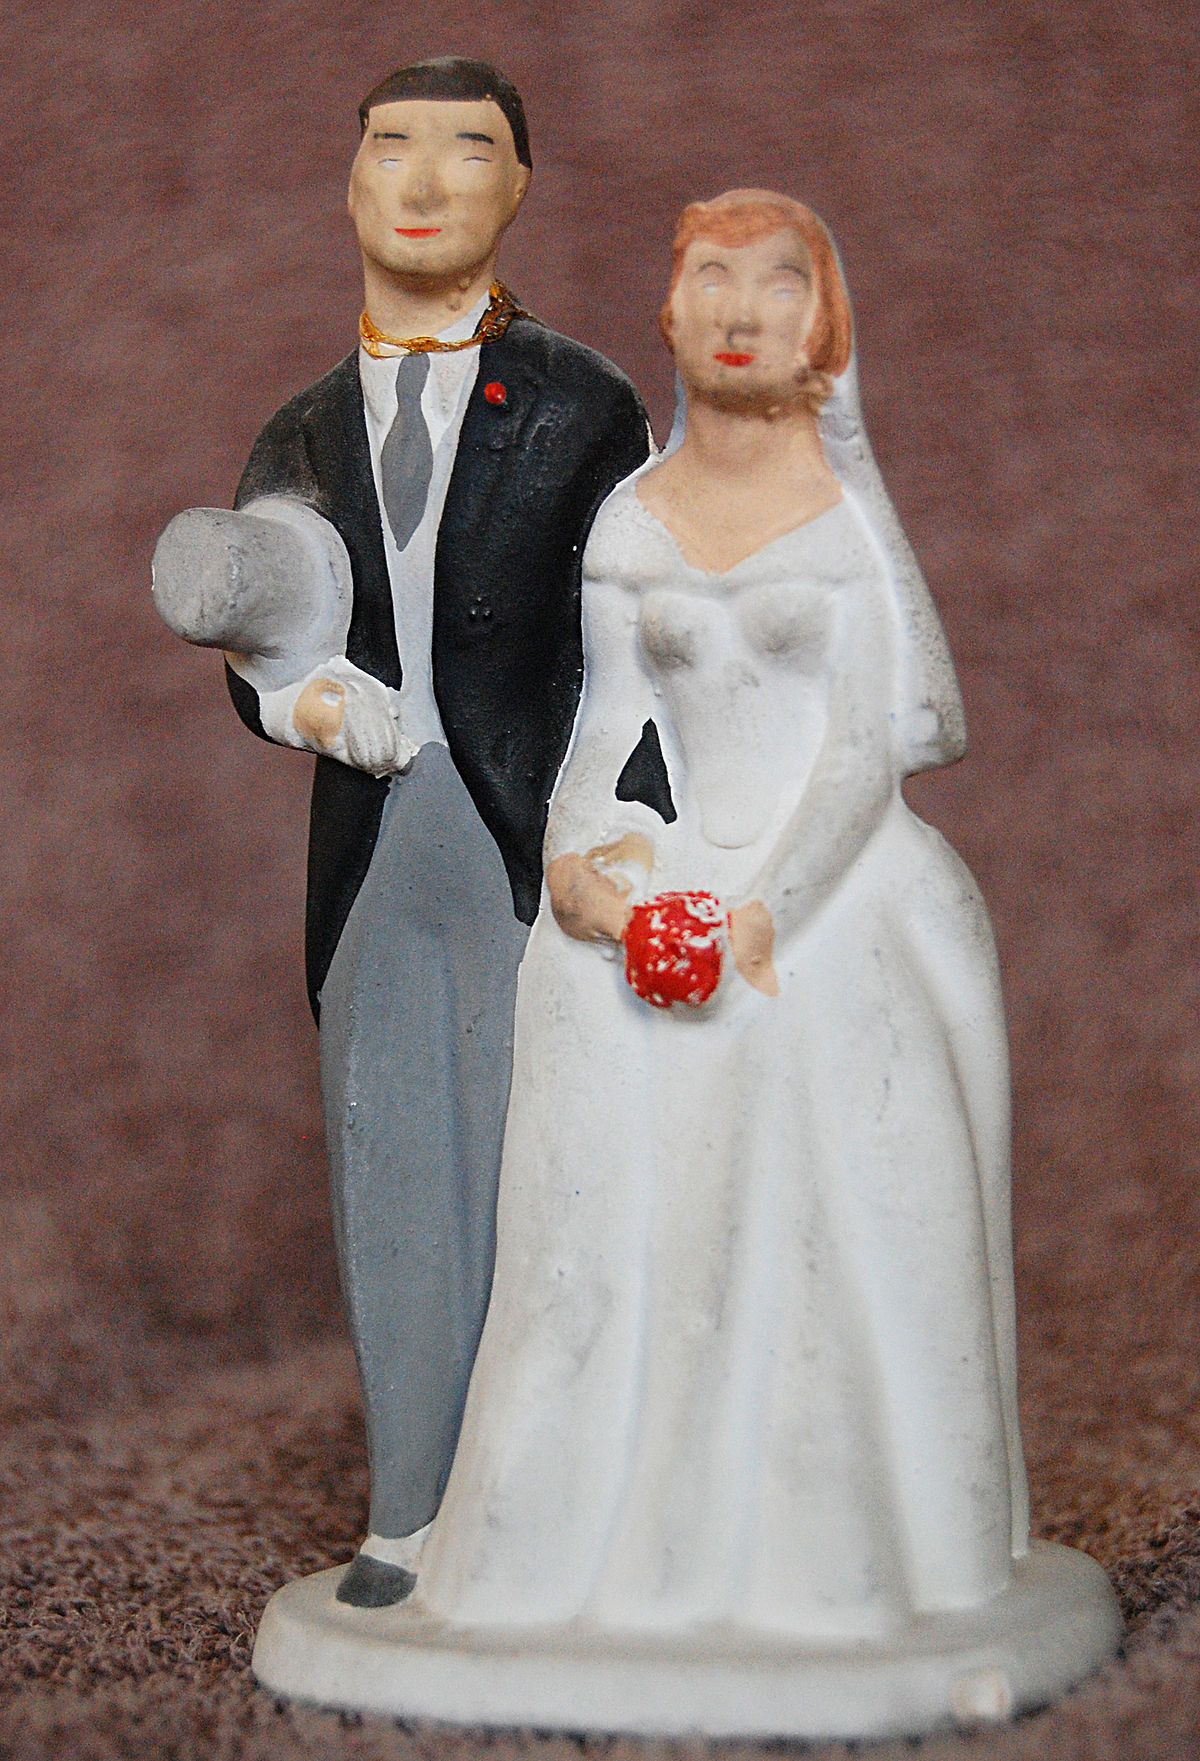 Wedding cake topper - Wikipedia